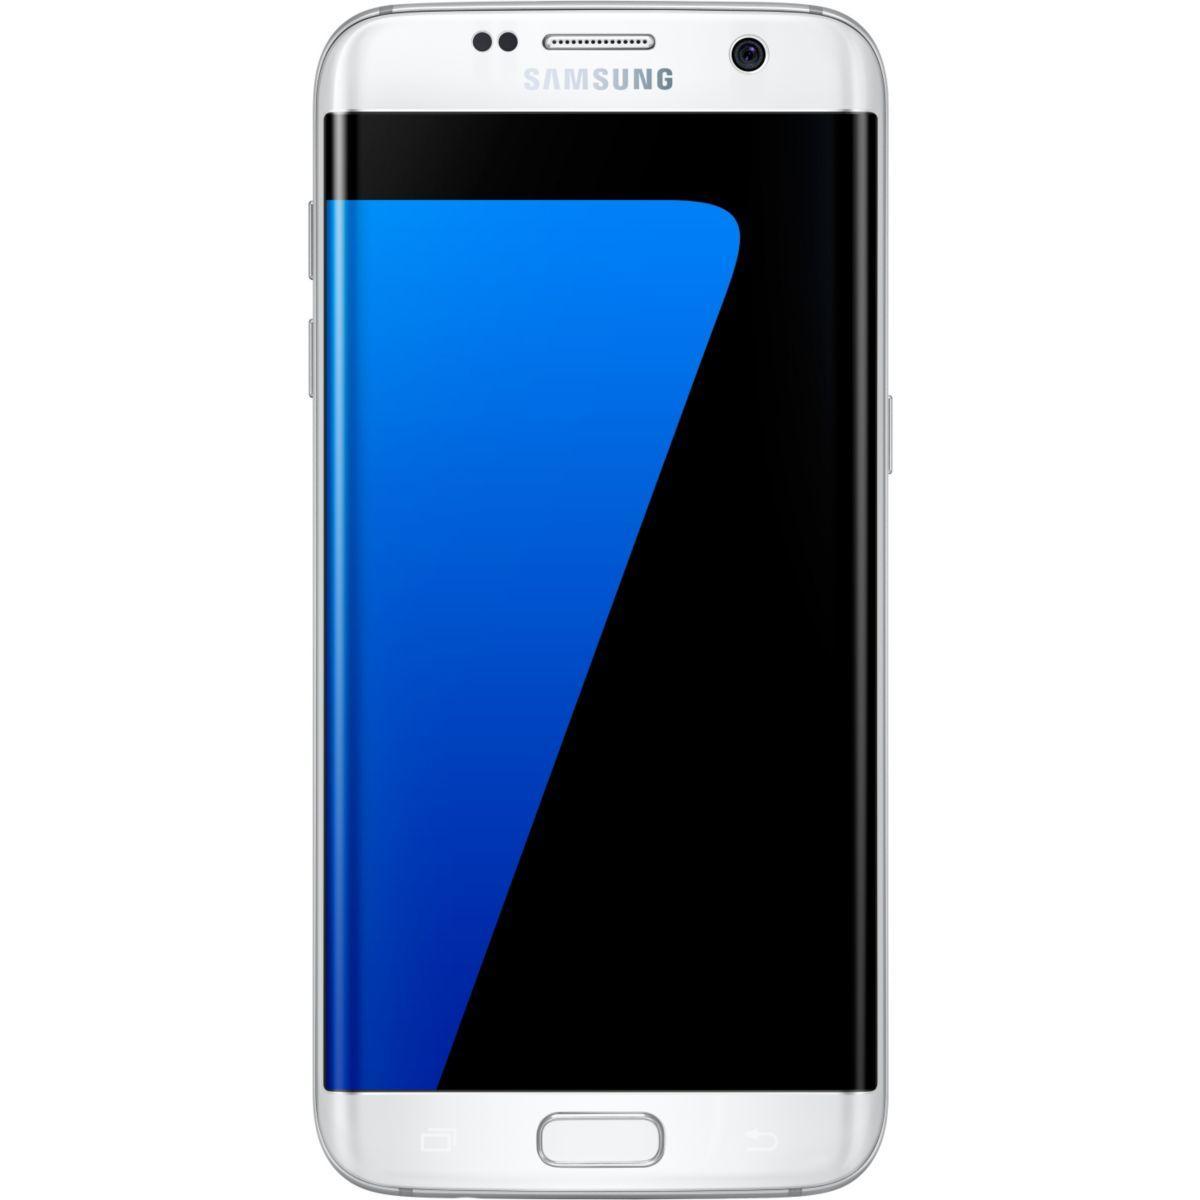 Pack promo smartphone samsung galaxy s7 edge 32go blanc + etui samsung view cover led galaxy s7 edge silver - soldes et bonnes affaires à prix imbatta